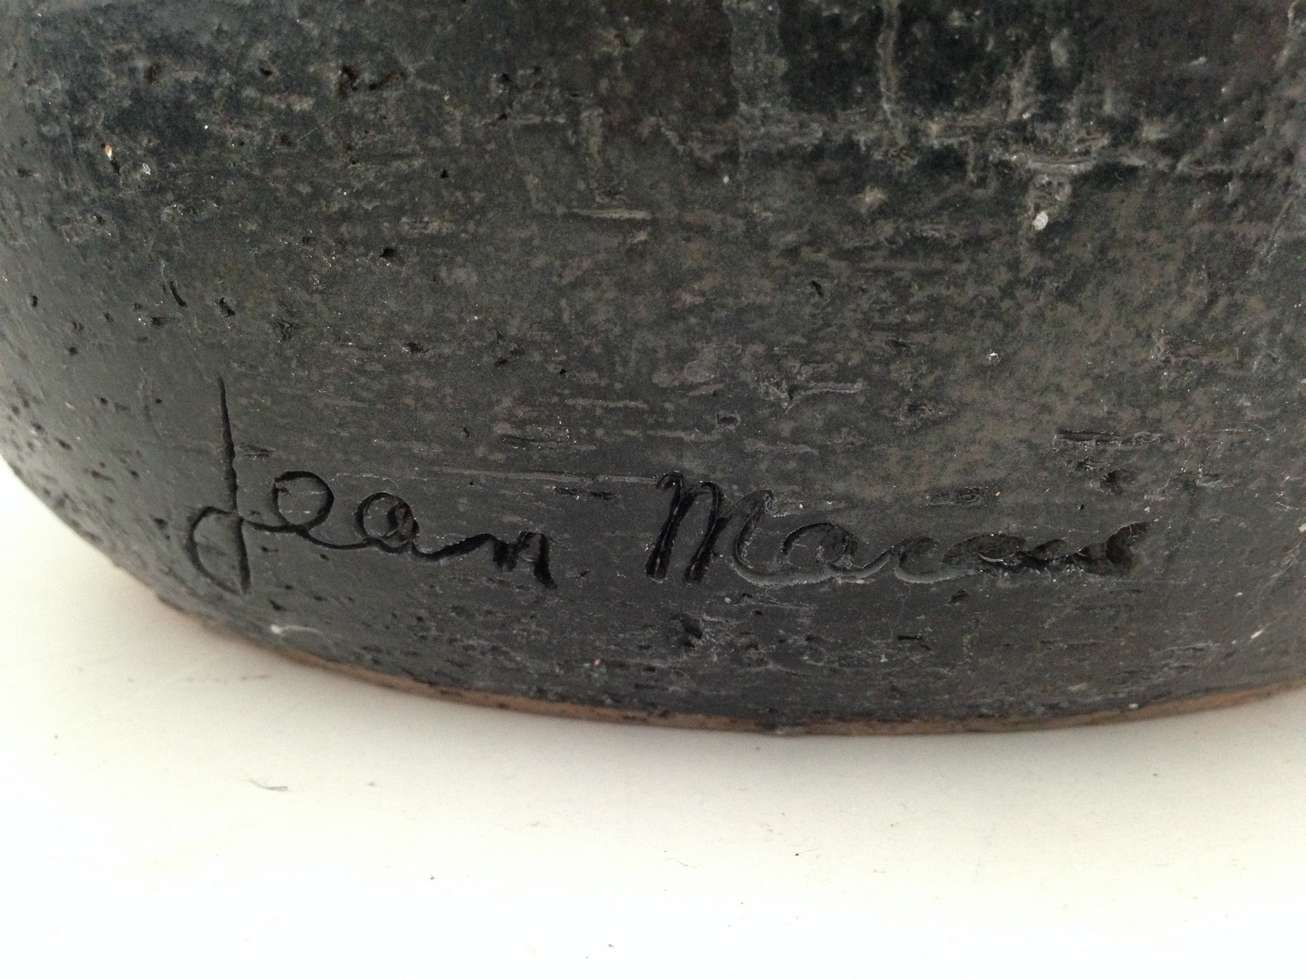 jean-marais-signature-poterie-art-restaurarte.jpg